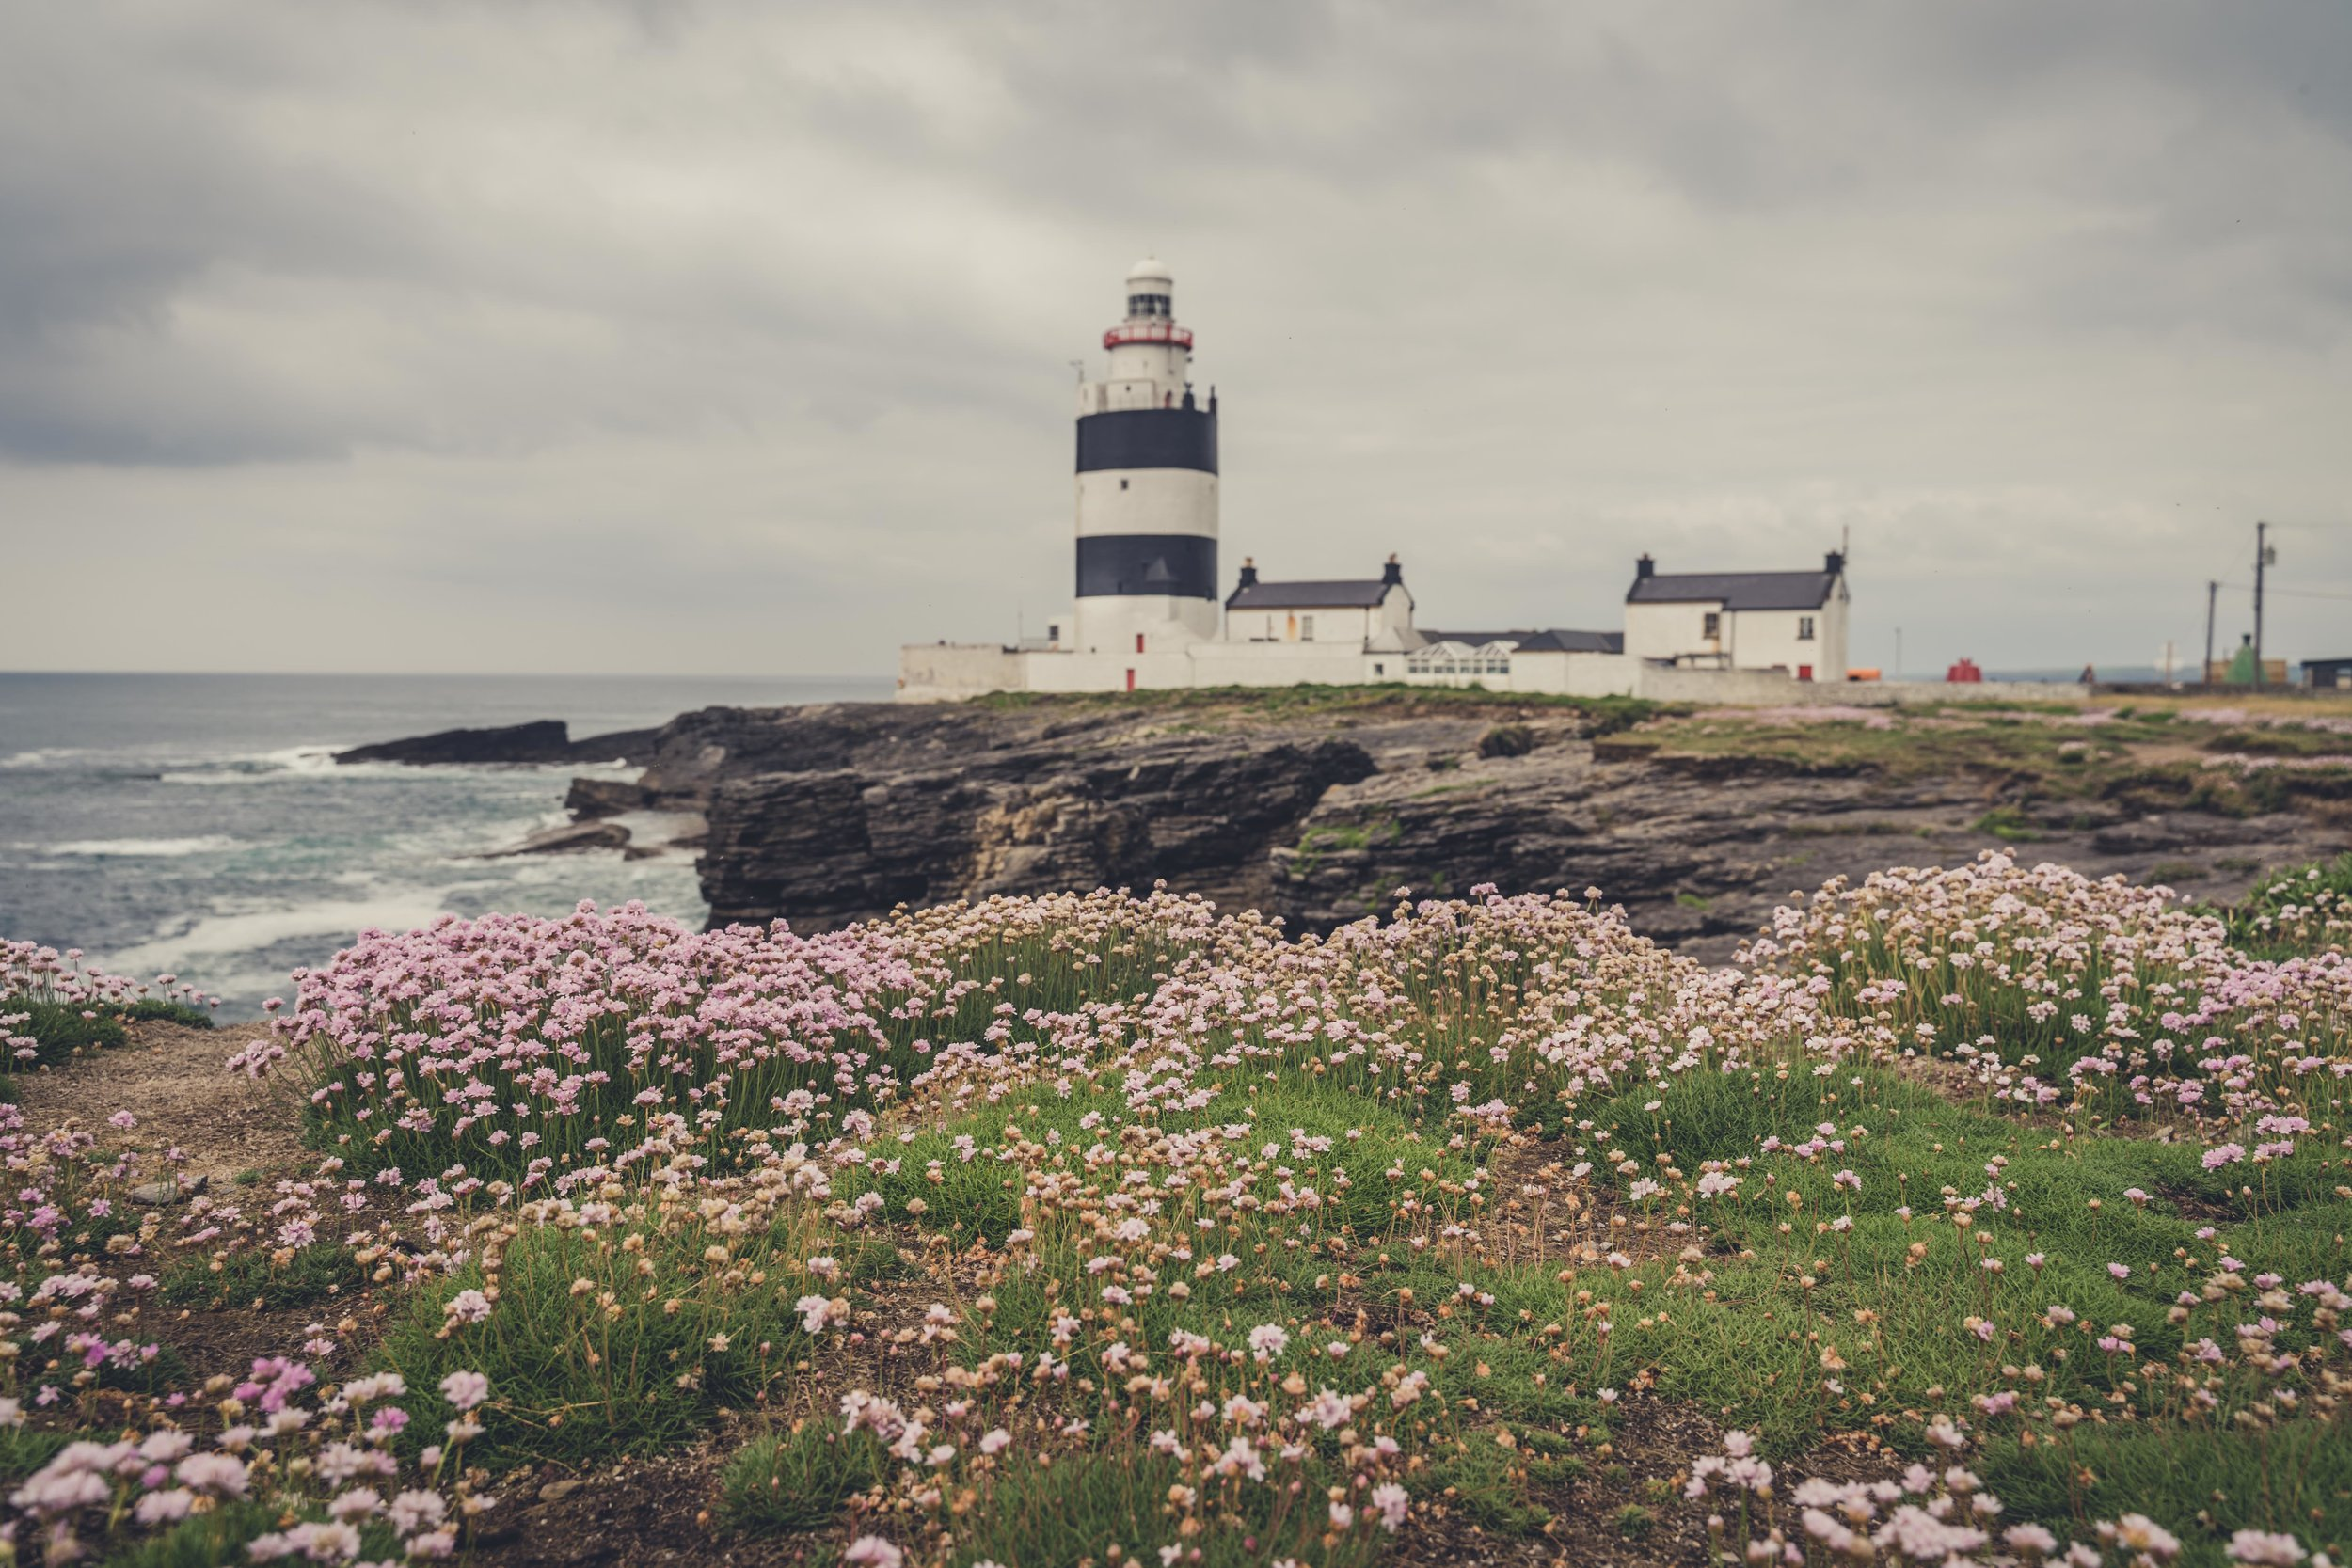 Hookhead Lighthouse wexford ireland flowers.jpg